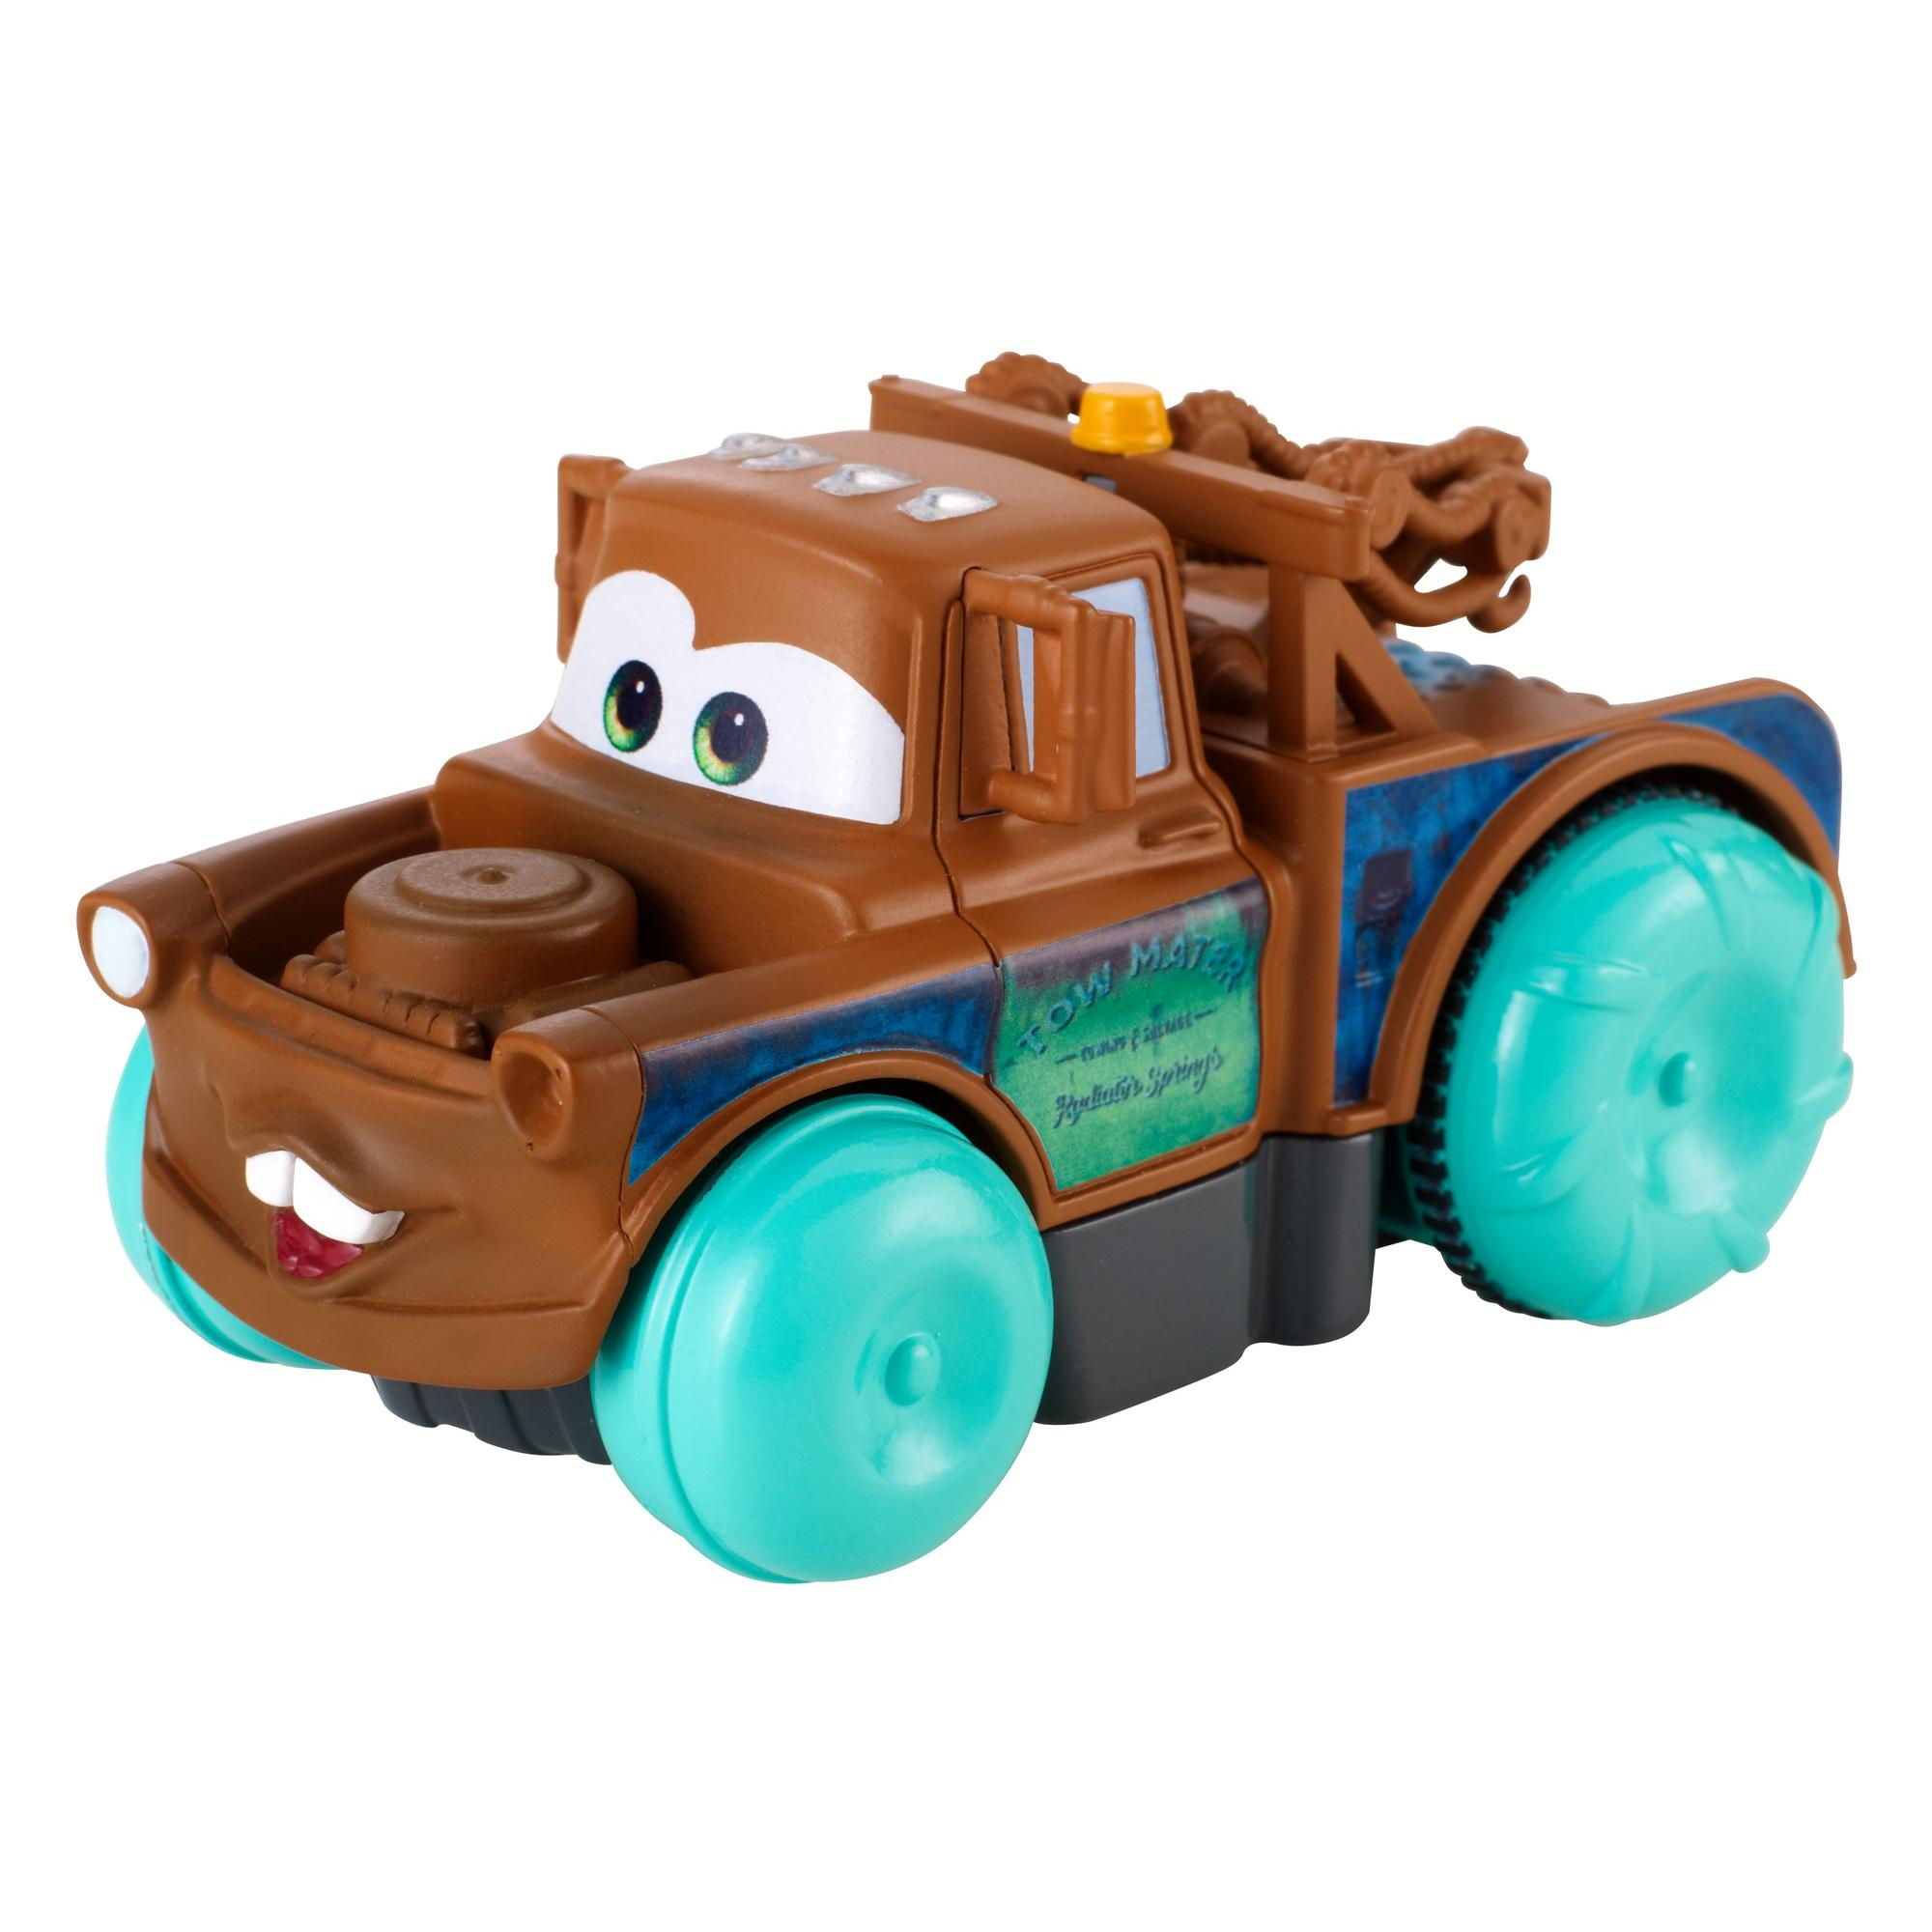 Mattel Disney/Pixar Cars Color Changers Mater Vehicle